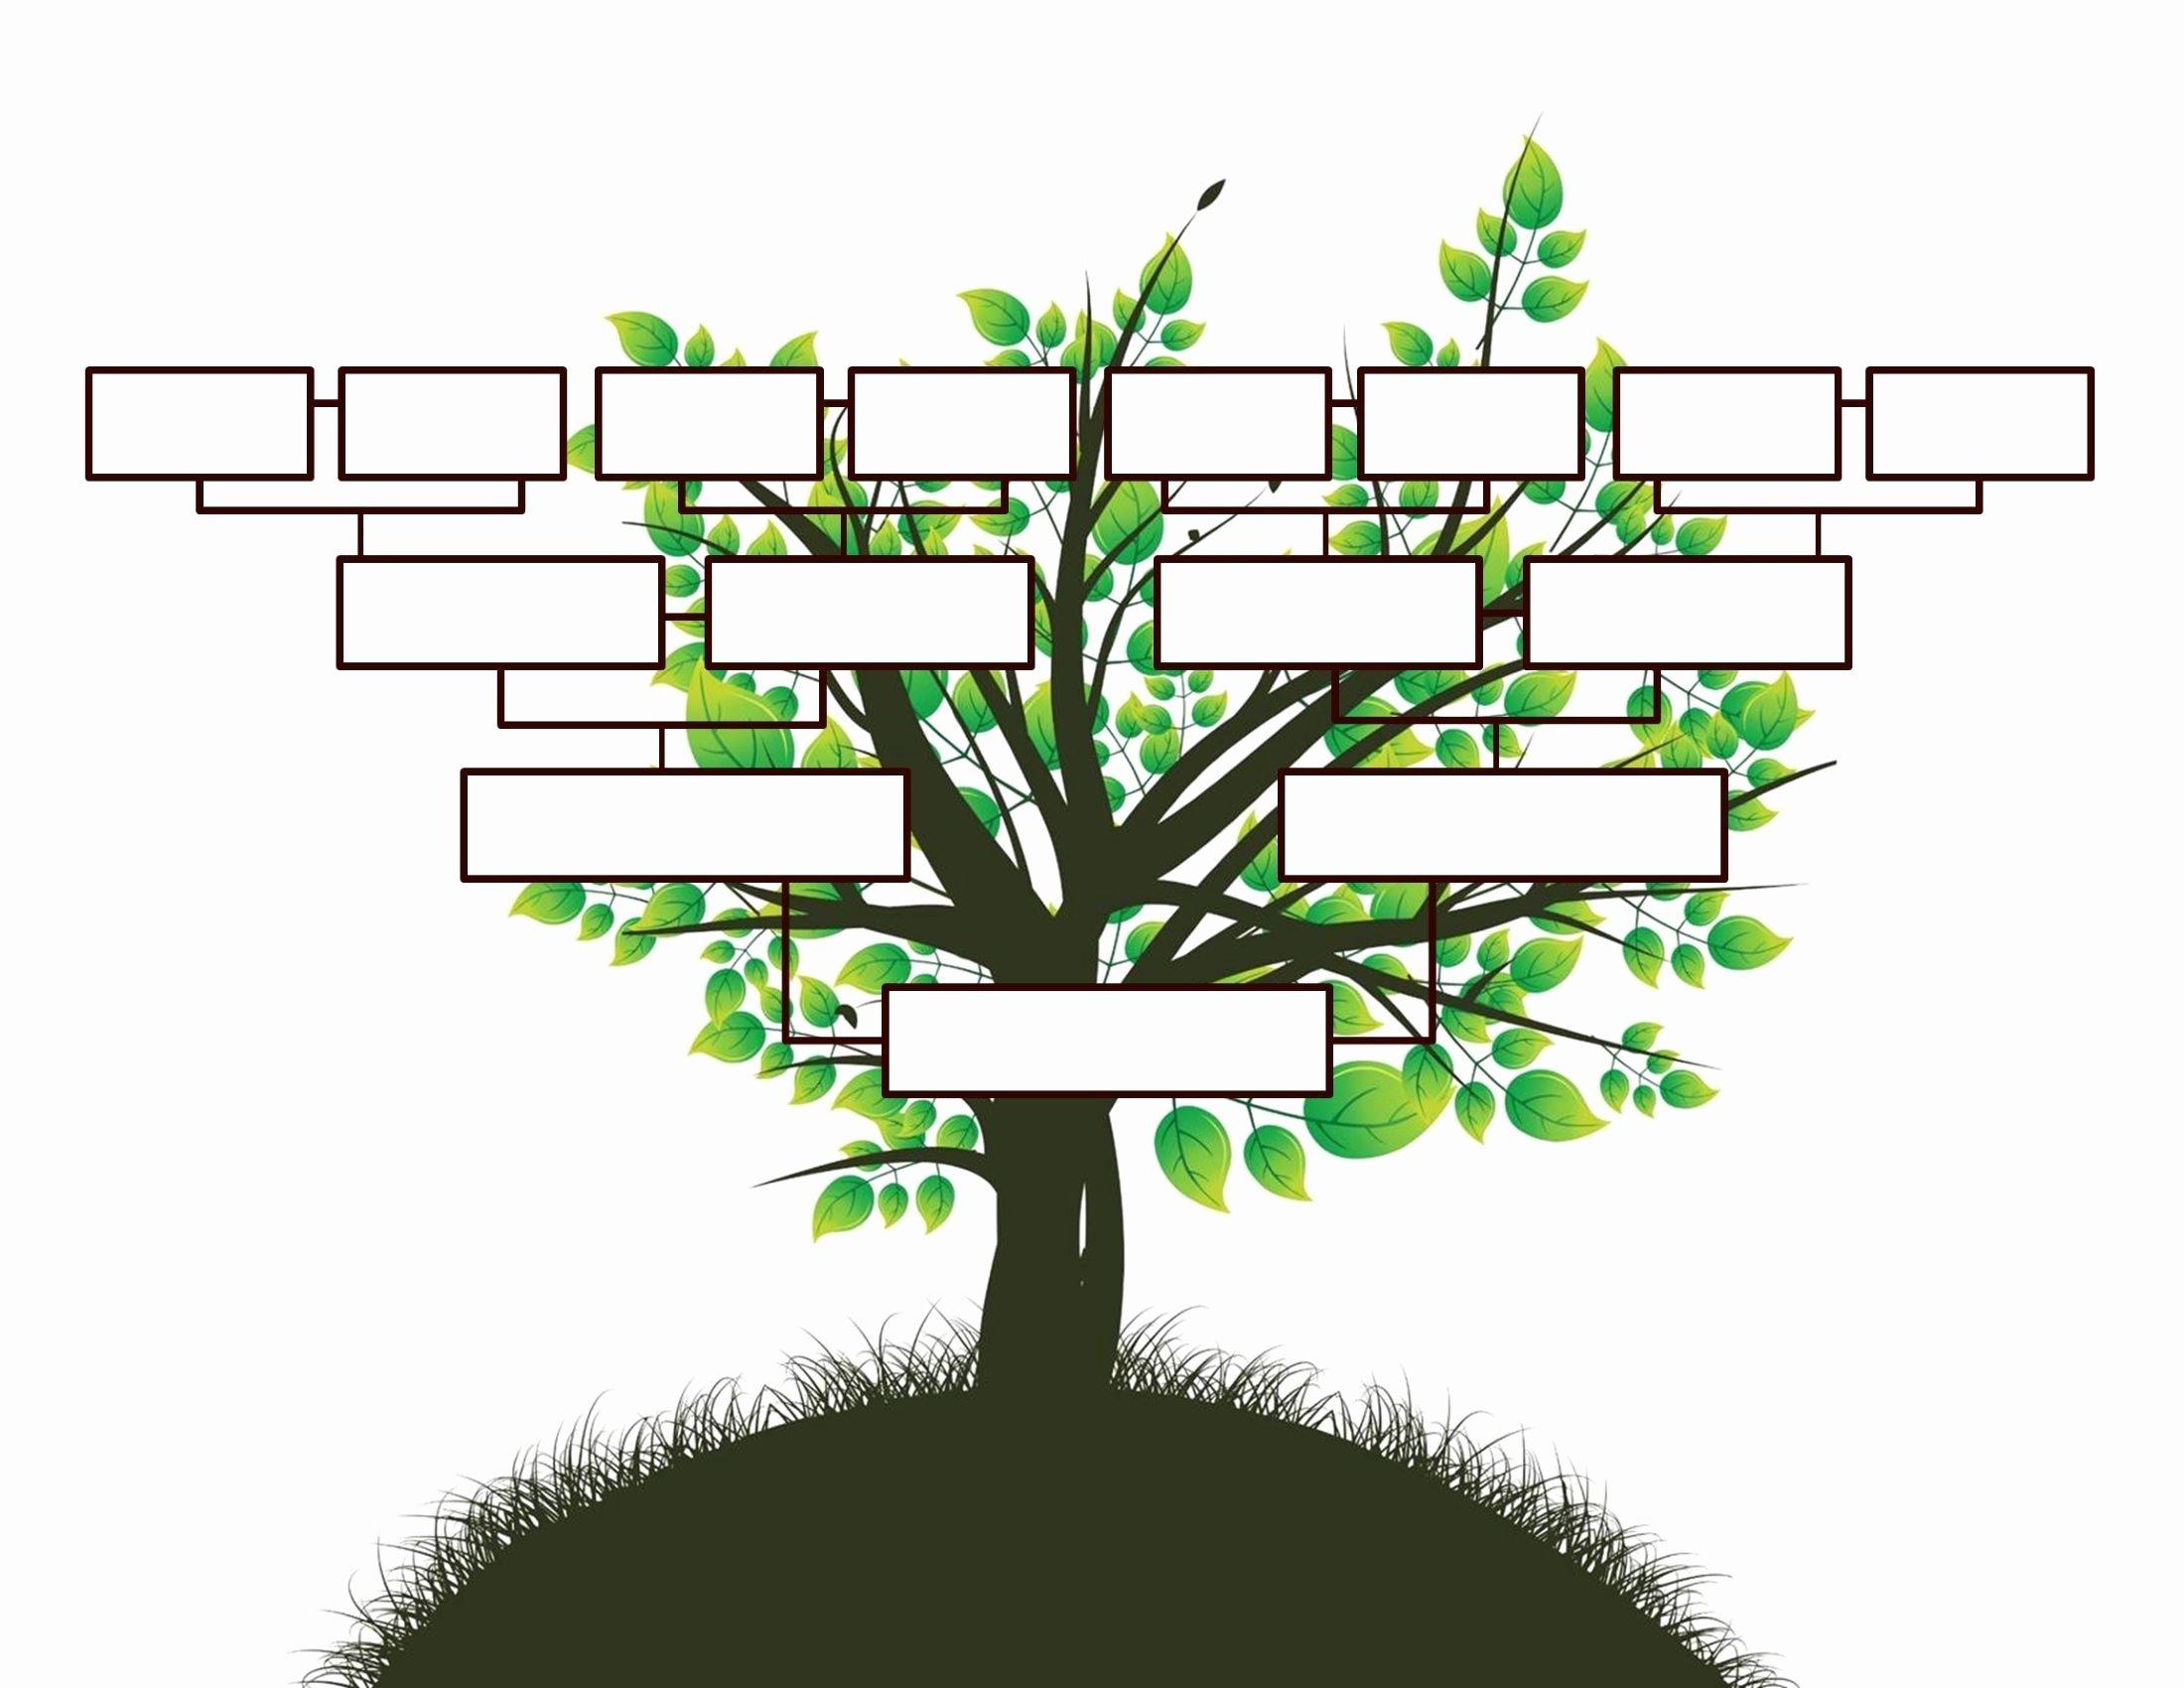 Editable Family Tree Template Unique Free Editable Family Tree Template Daily Roabox